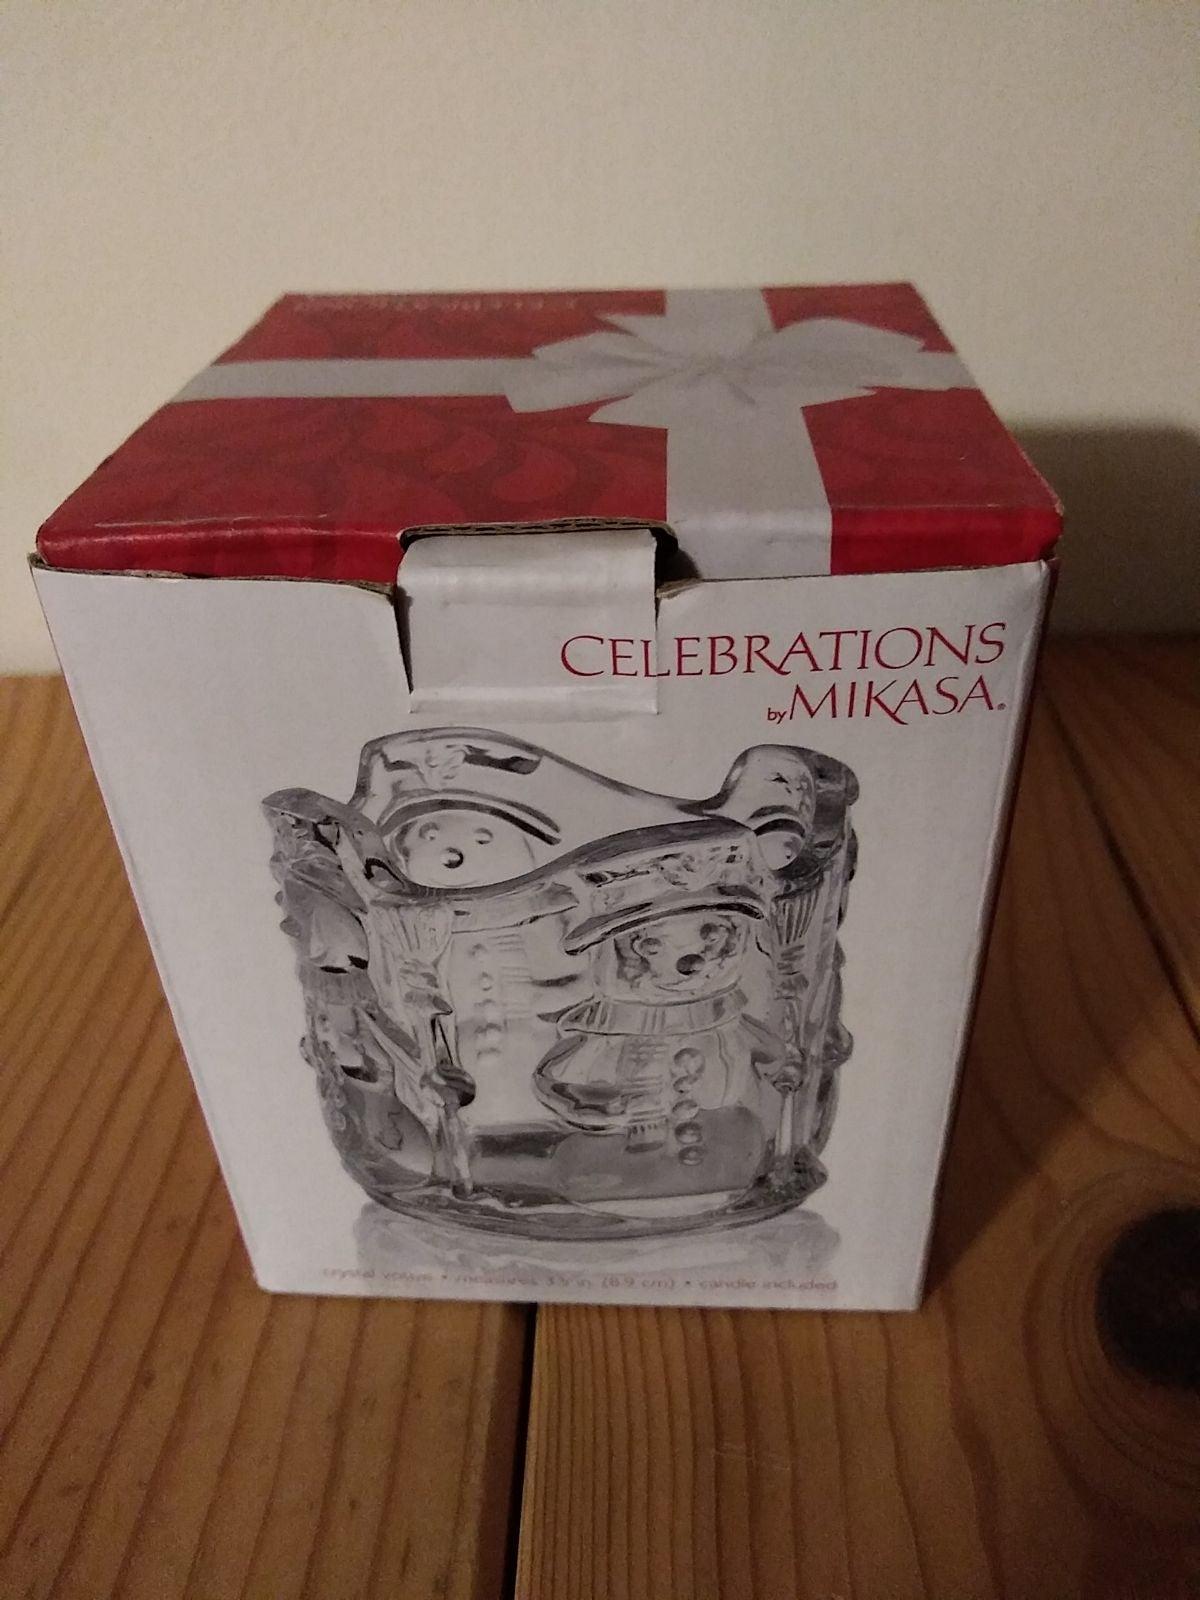 Celebrations By Mikasa Rejoice Collectio